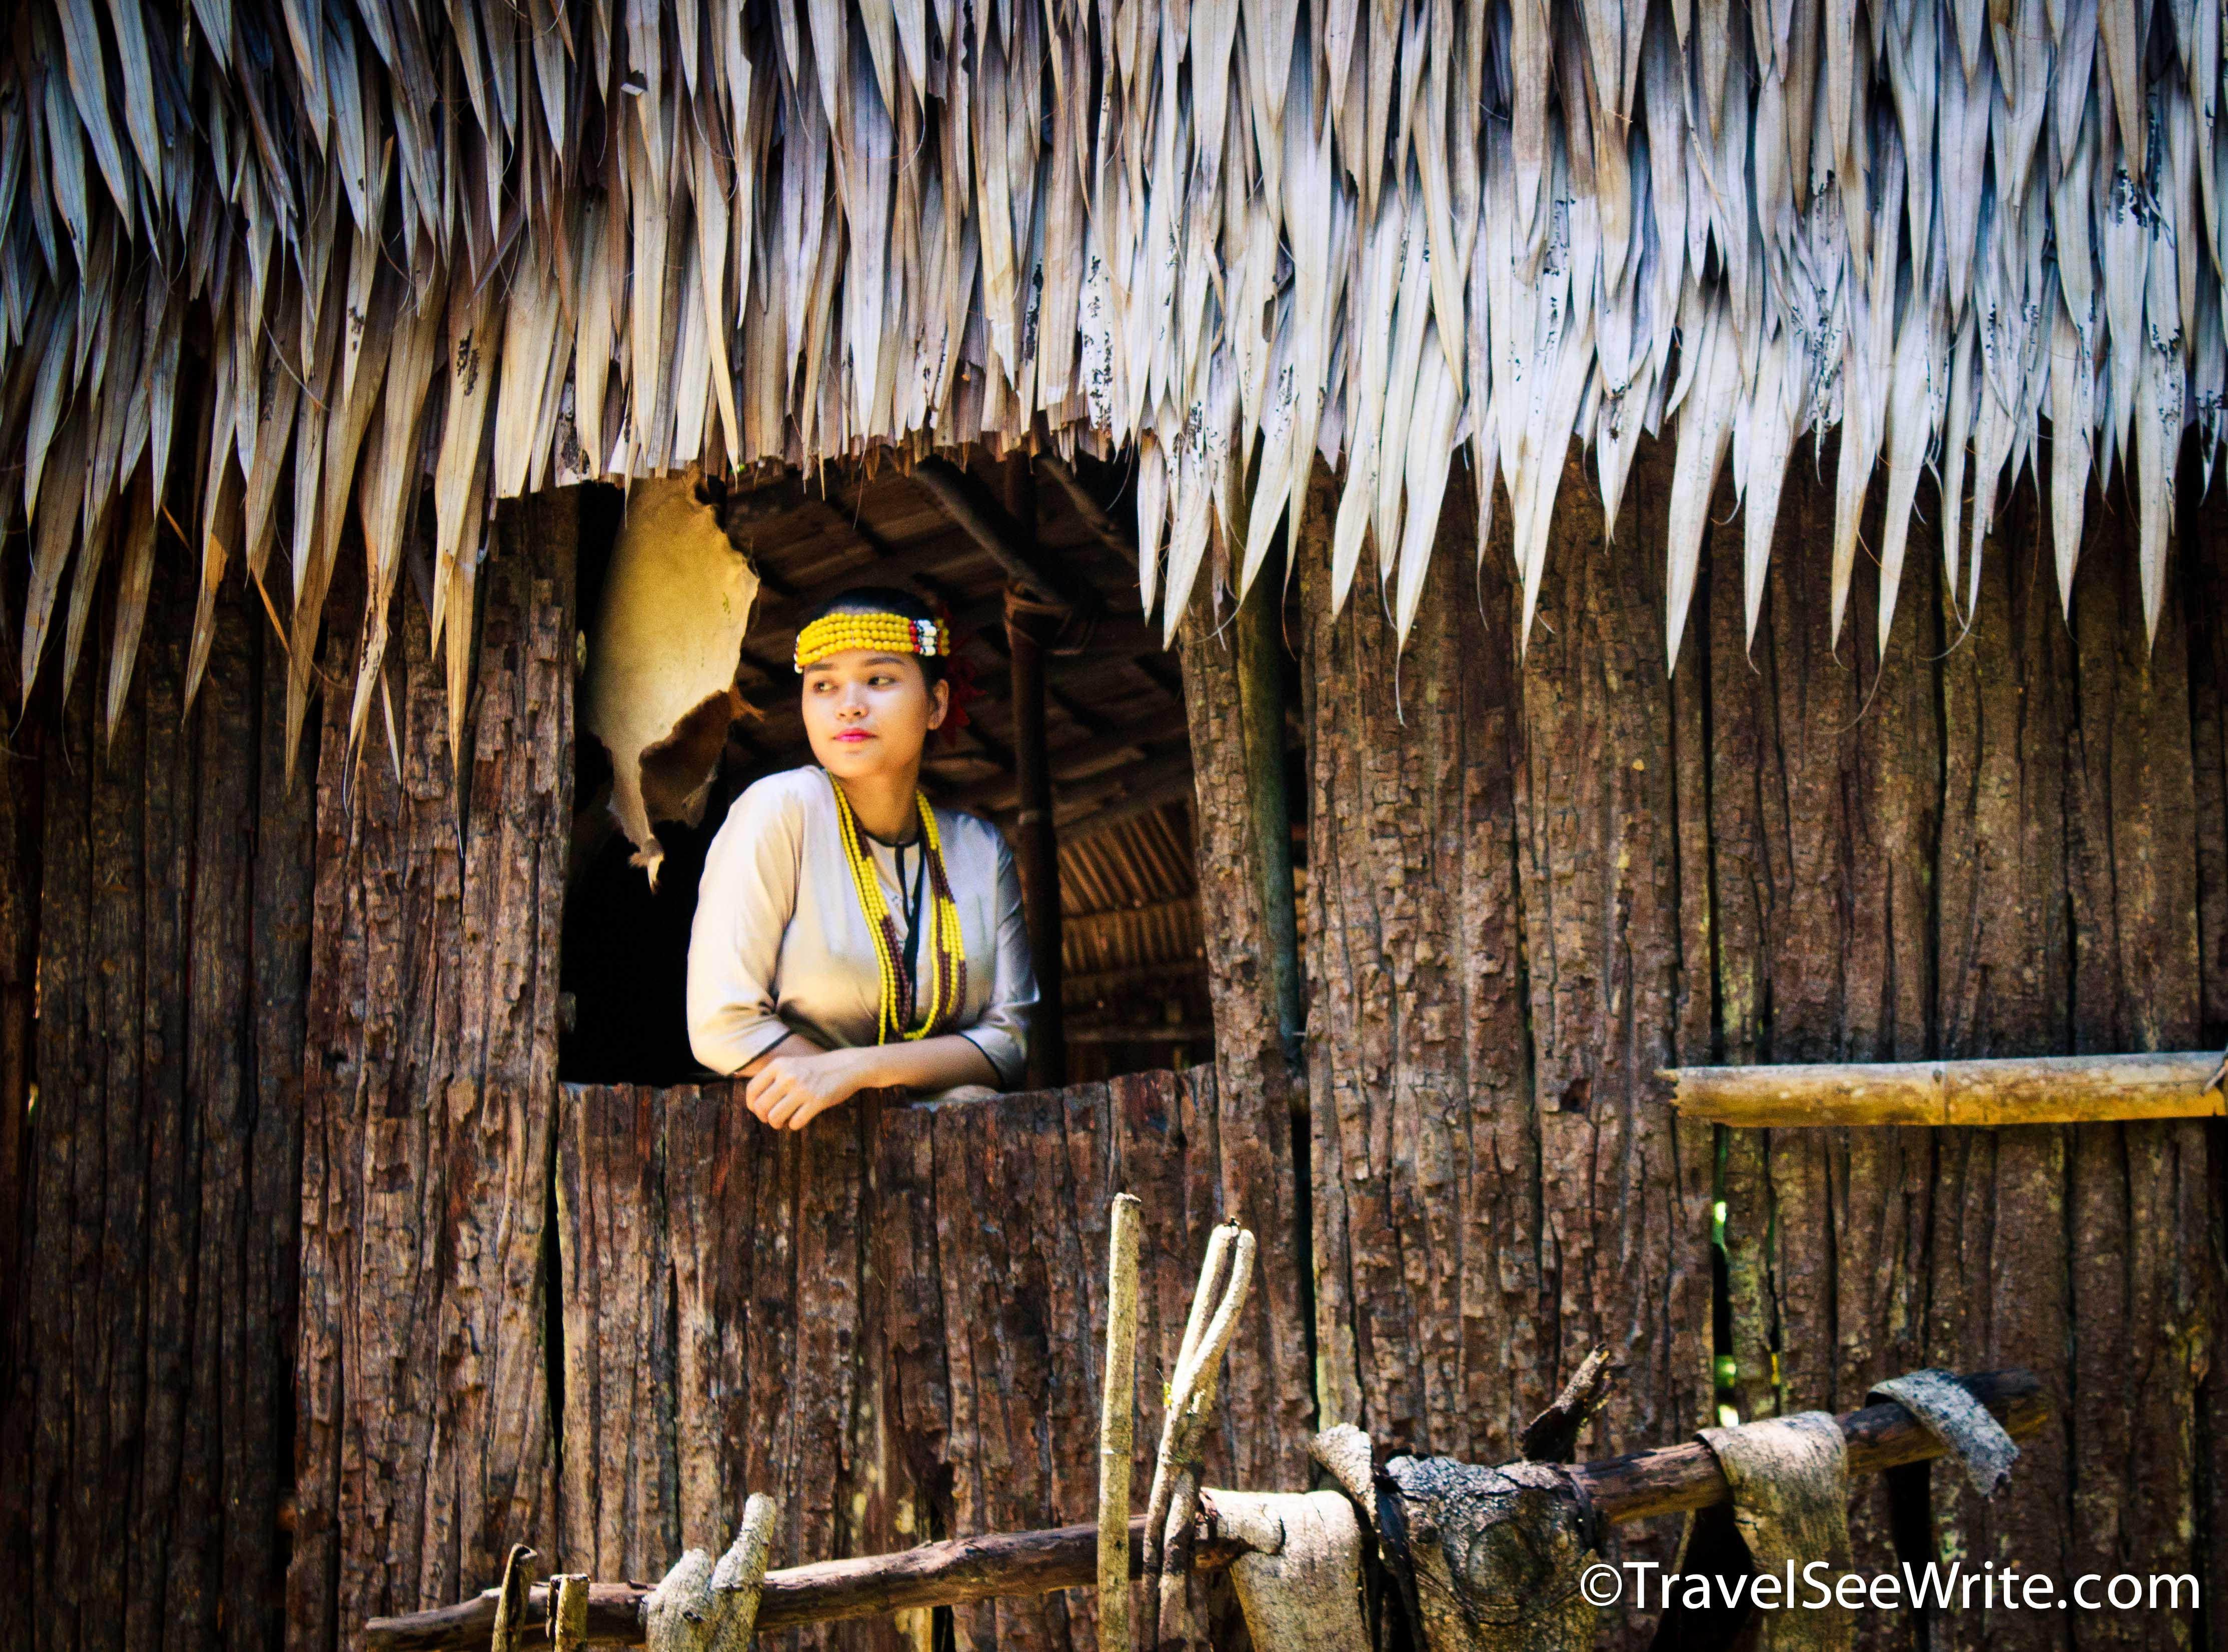 Bajau Tribe woman at her hut, Mari Mari village, Sabah, Malaysia - southeast asia travel